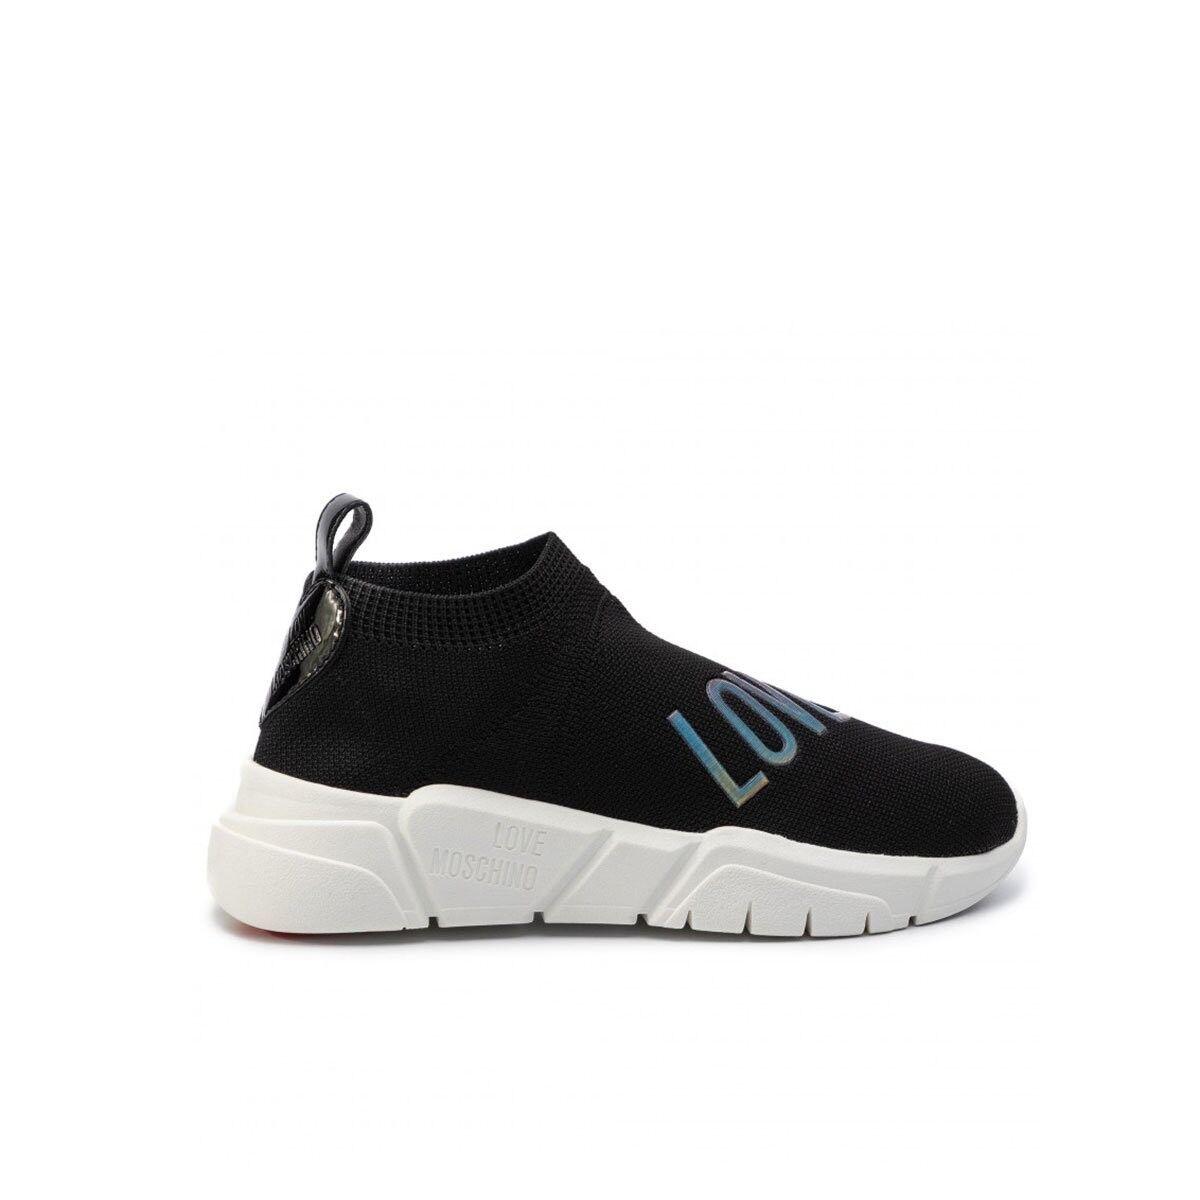 Love Moschino Scarpa Sneakers Donna Moschino Nera Ja15343g18iw